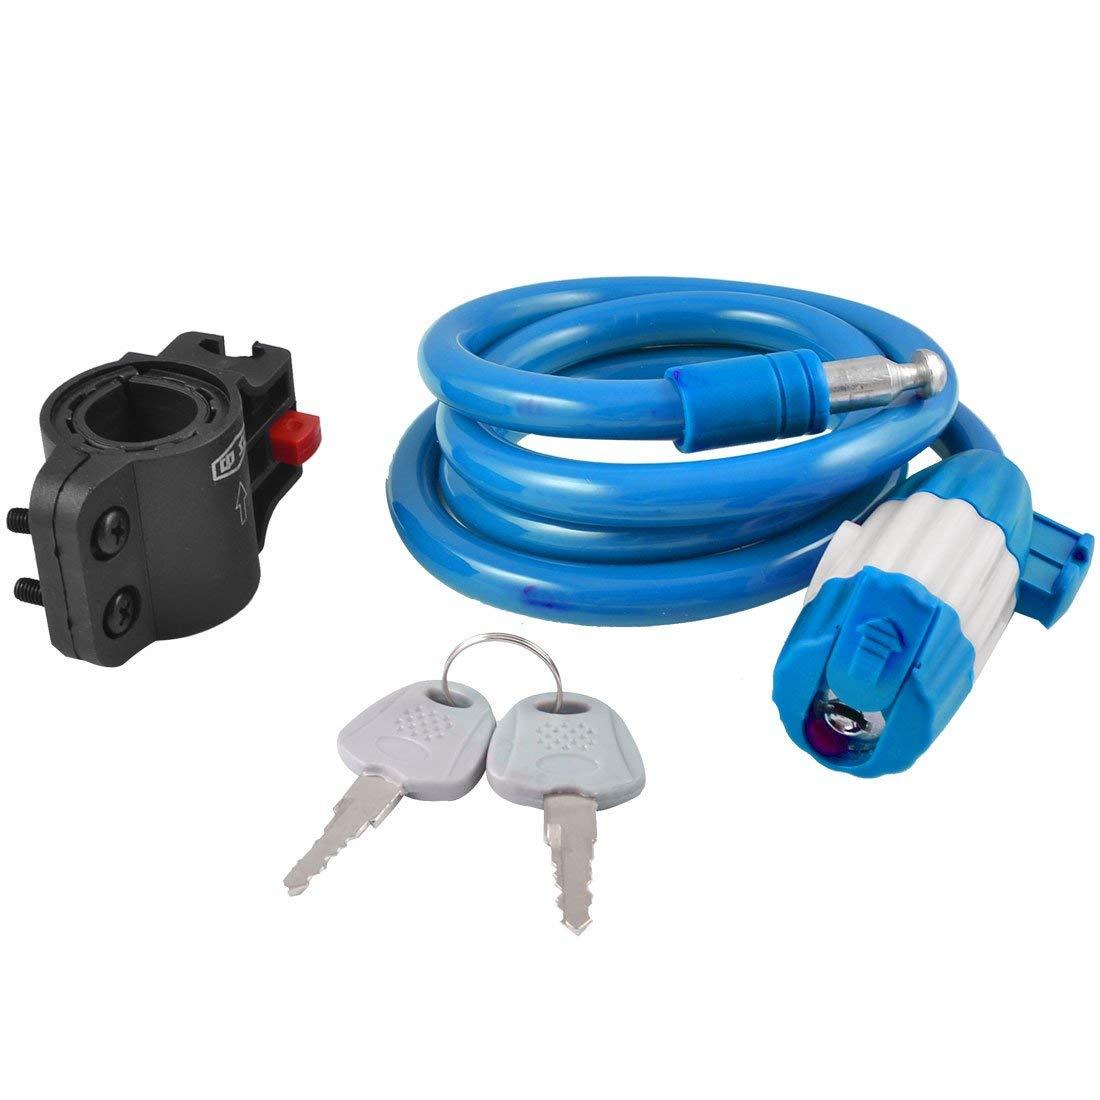 Aexit 1.2m 3.9ft Bike Locks Blue Motorbike Bicycle Bike Security Spiral Cable Wire Lock U-Locks w Bracket